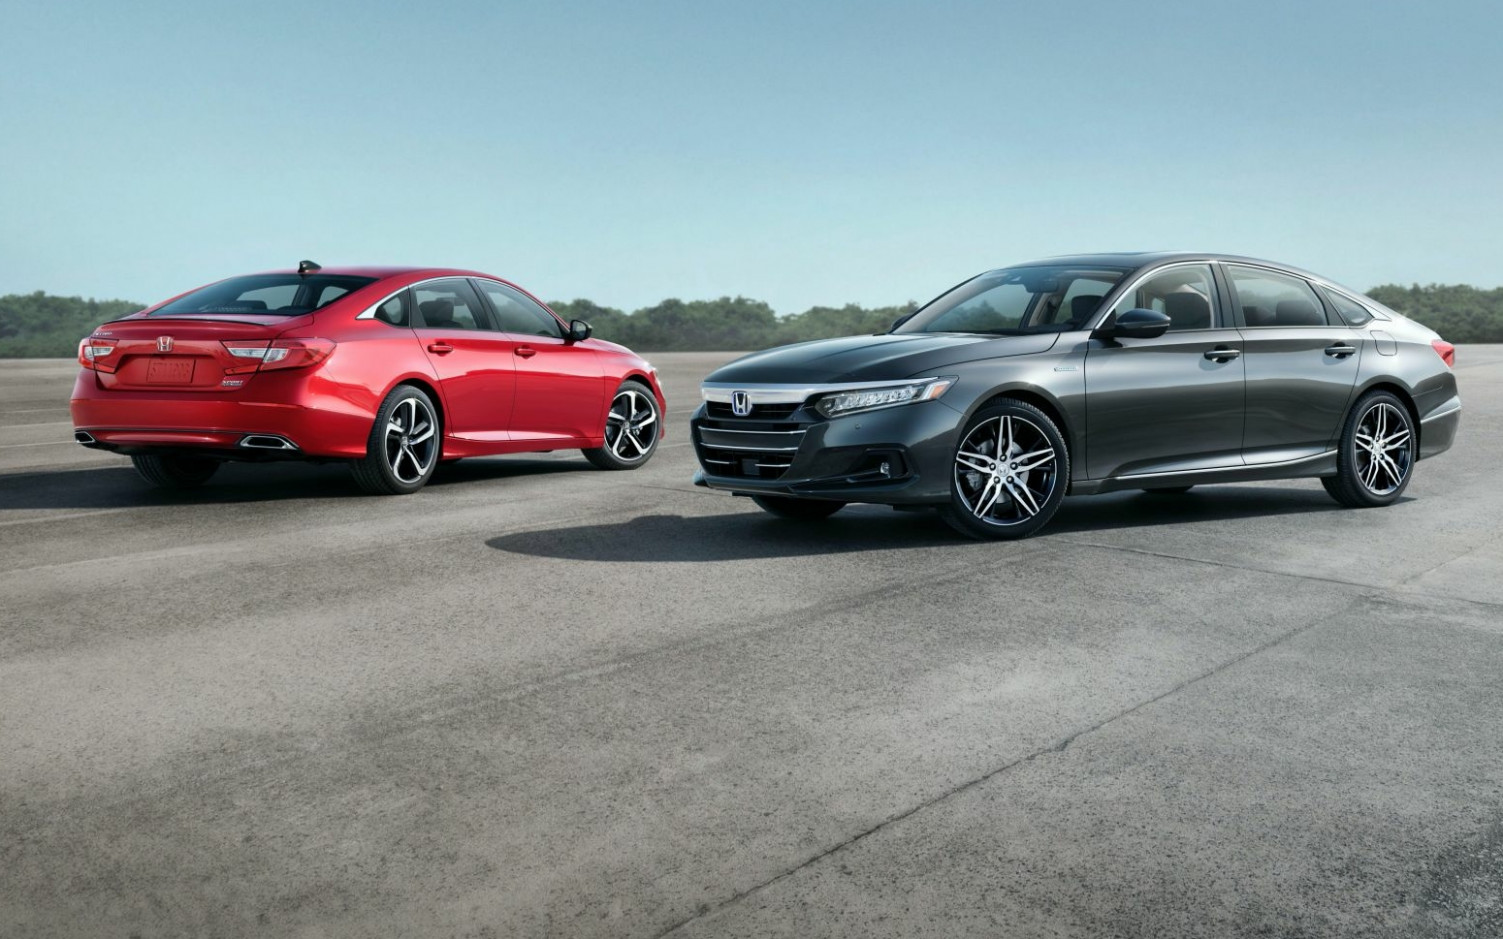 Performance 2022 Honda Accord Hybrid